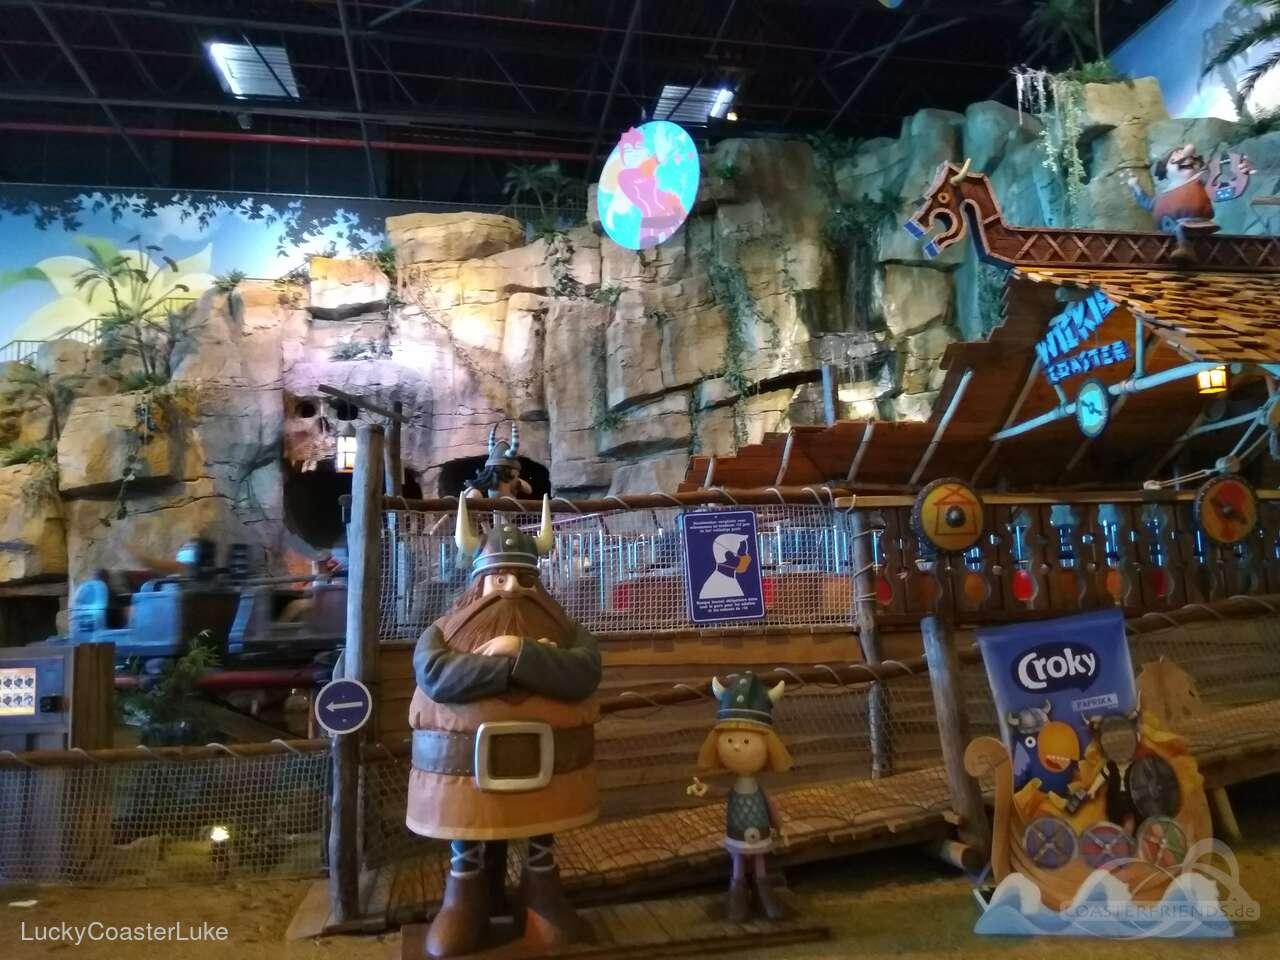 Wickie Coaster im Park Plopsa Indoor Hasselt Impressionen